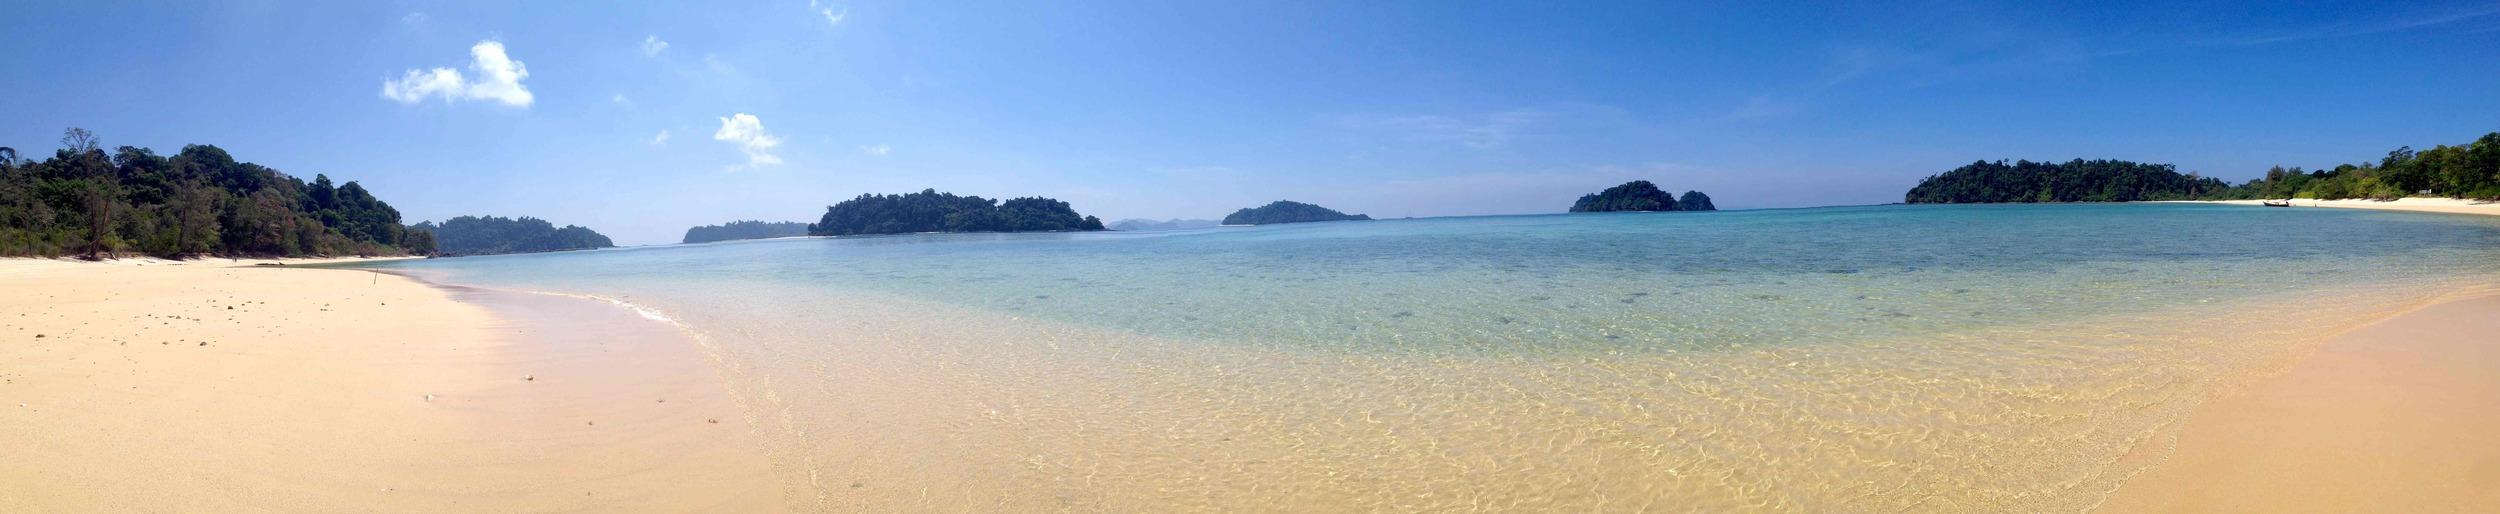 Endless lonely beach in Burma's Mergui Archipelago.jpg